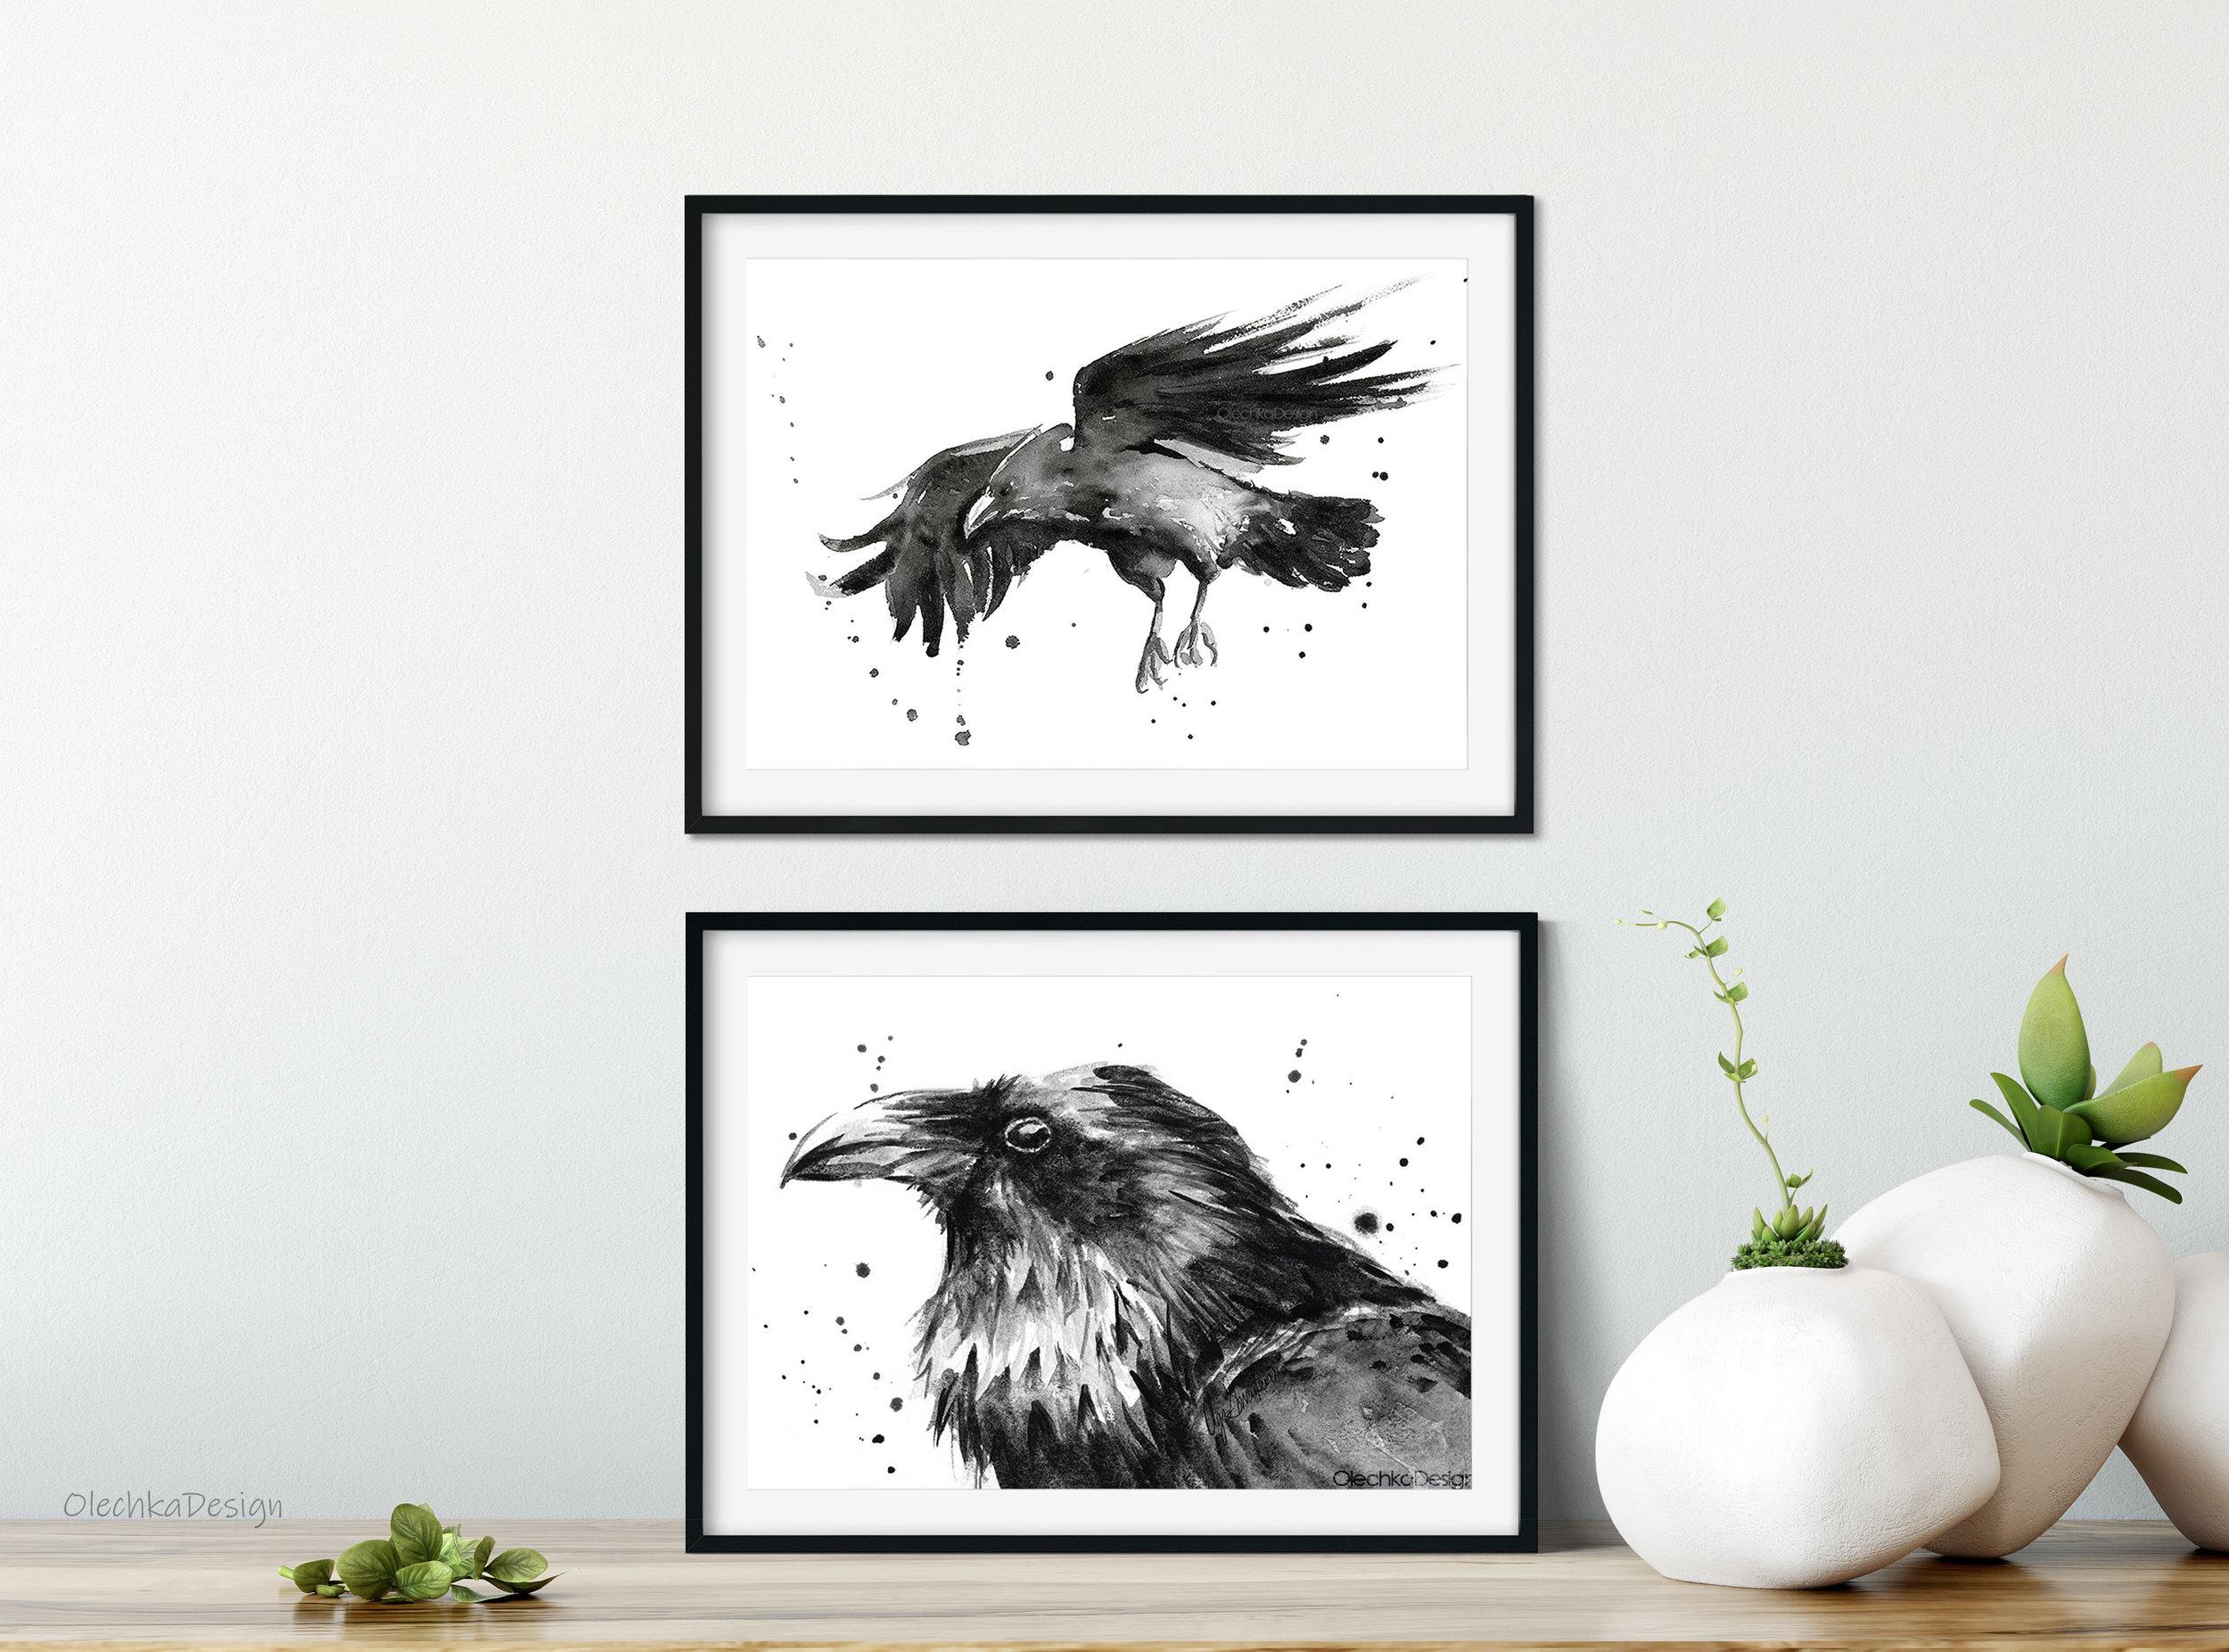 raven-wall-art-print-watercolor.jpg